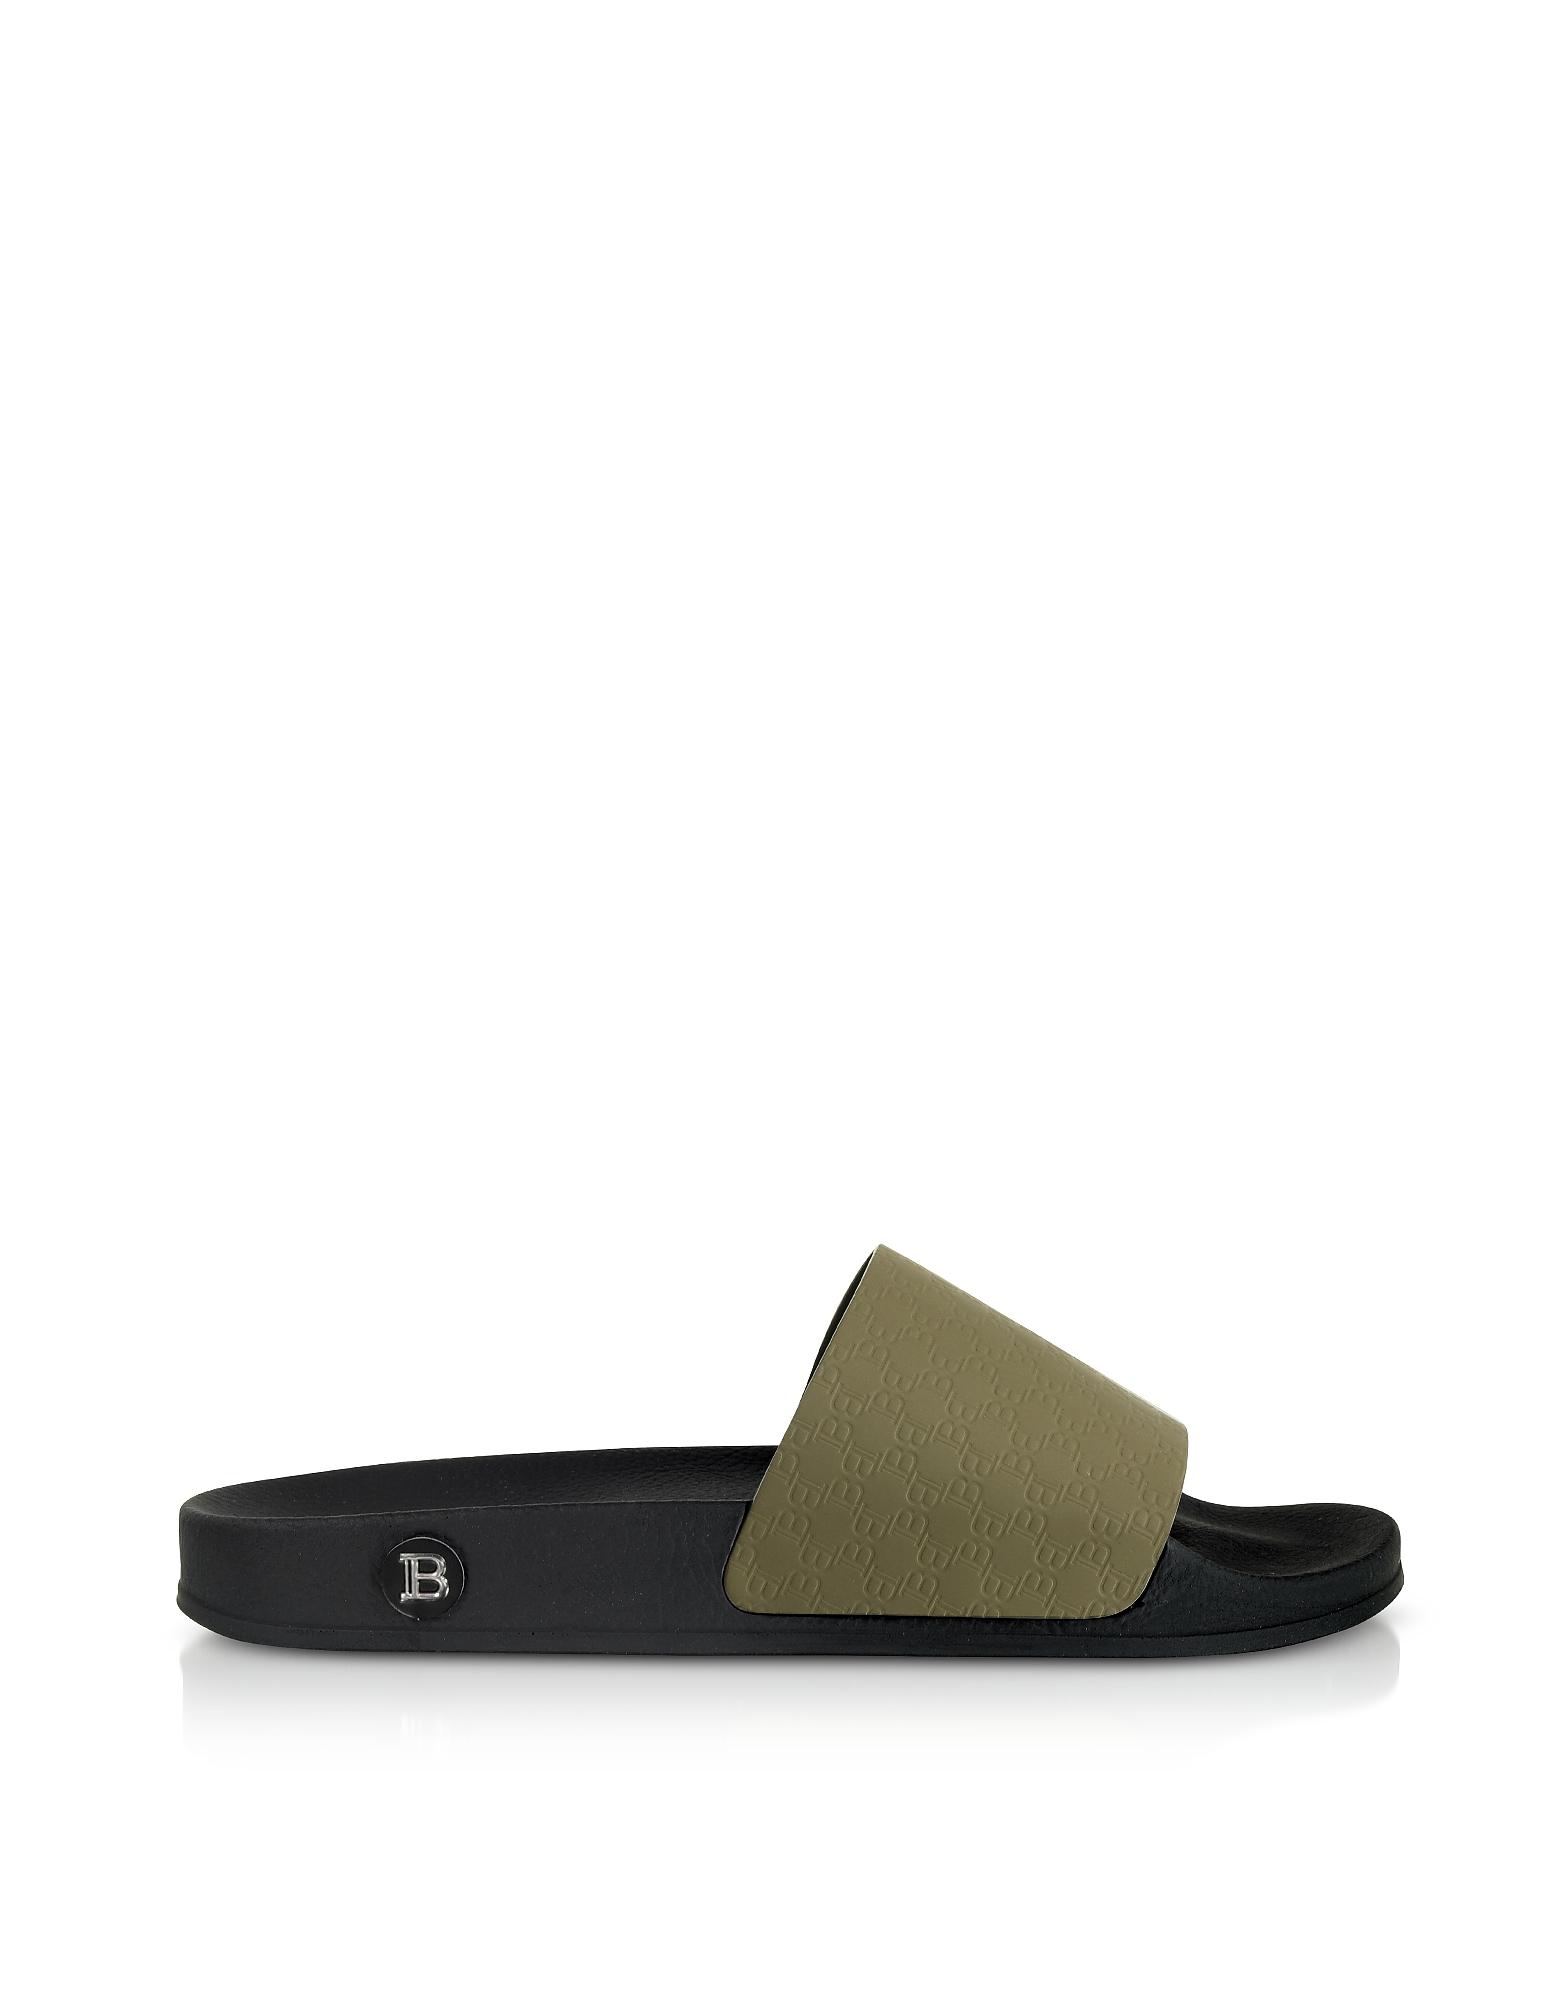 Balmain Designer Shoes, Dark Green Men's Calypso Slide Sandals